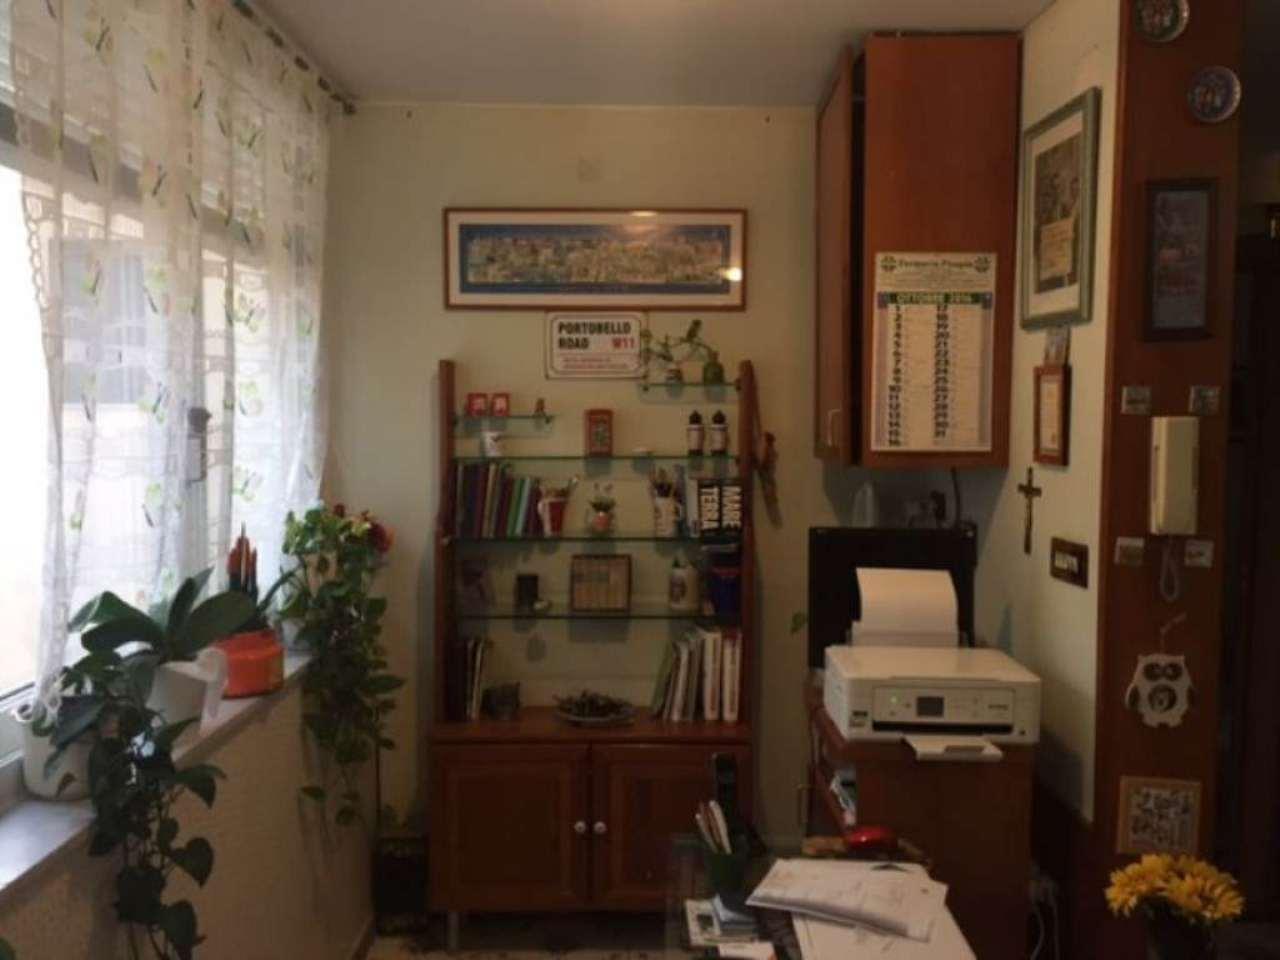 Bilocale Napoli Via Luca Giordano 6